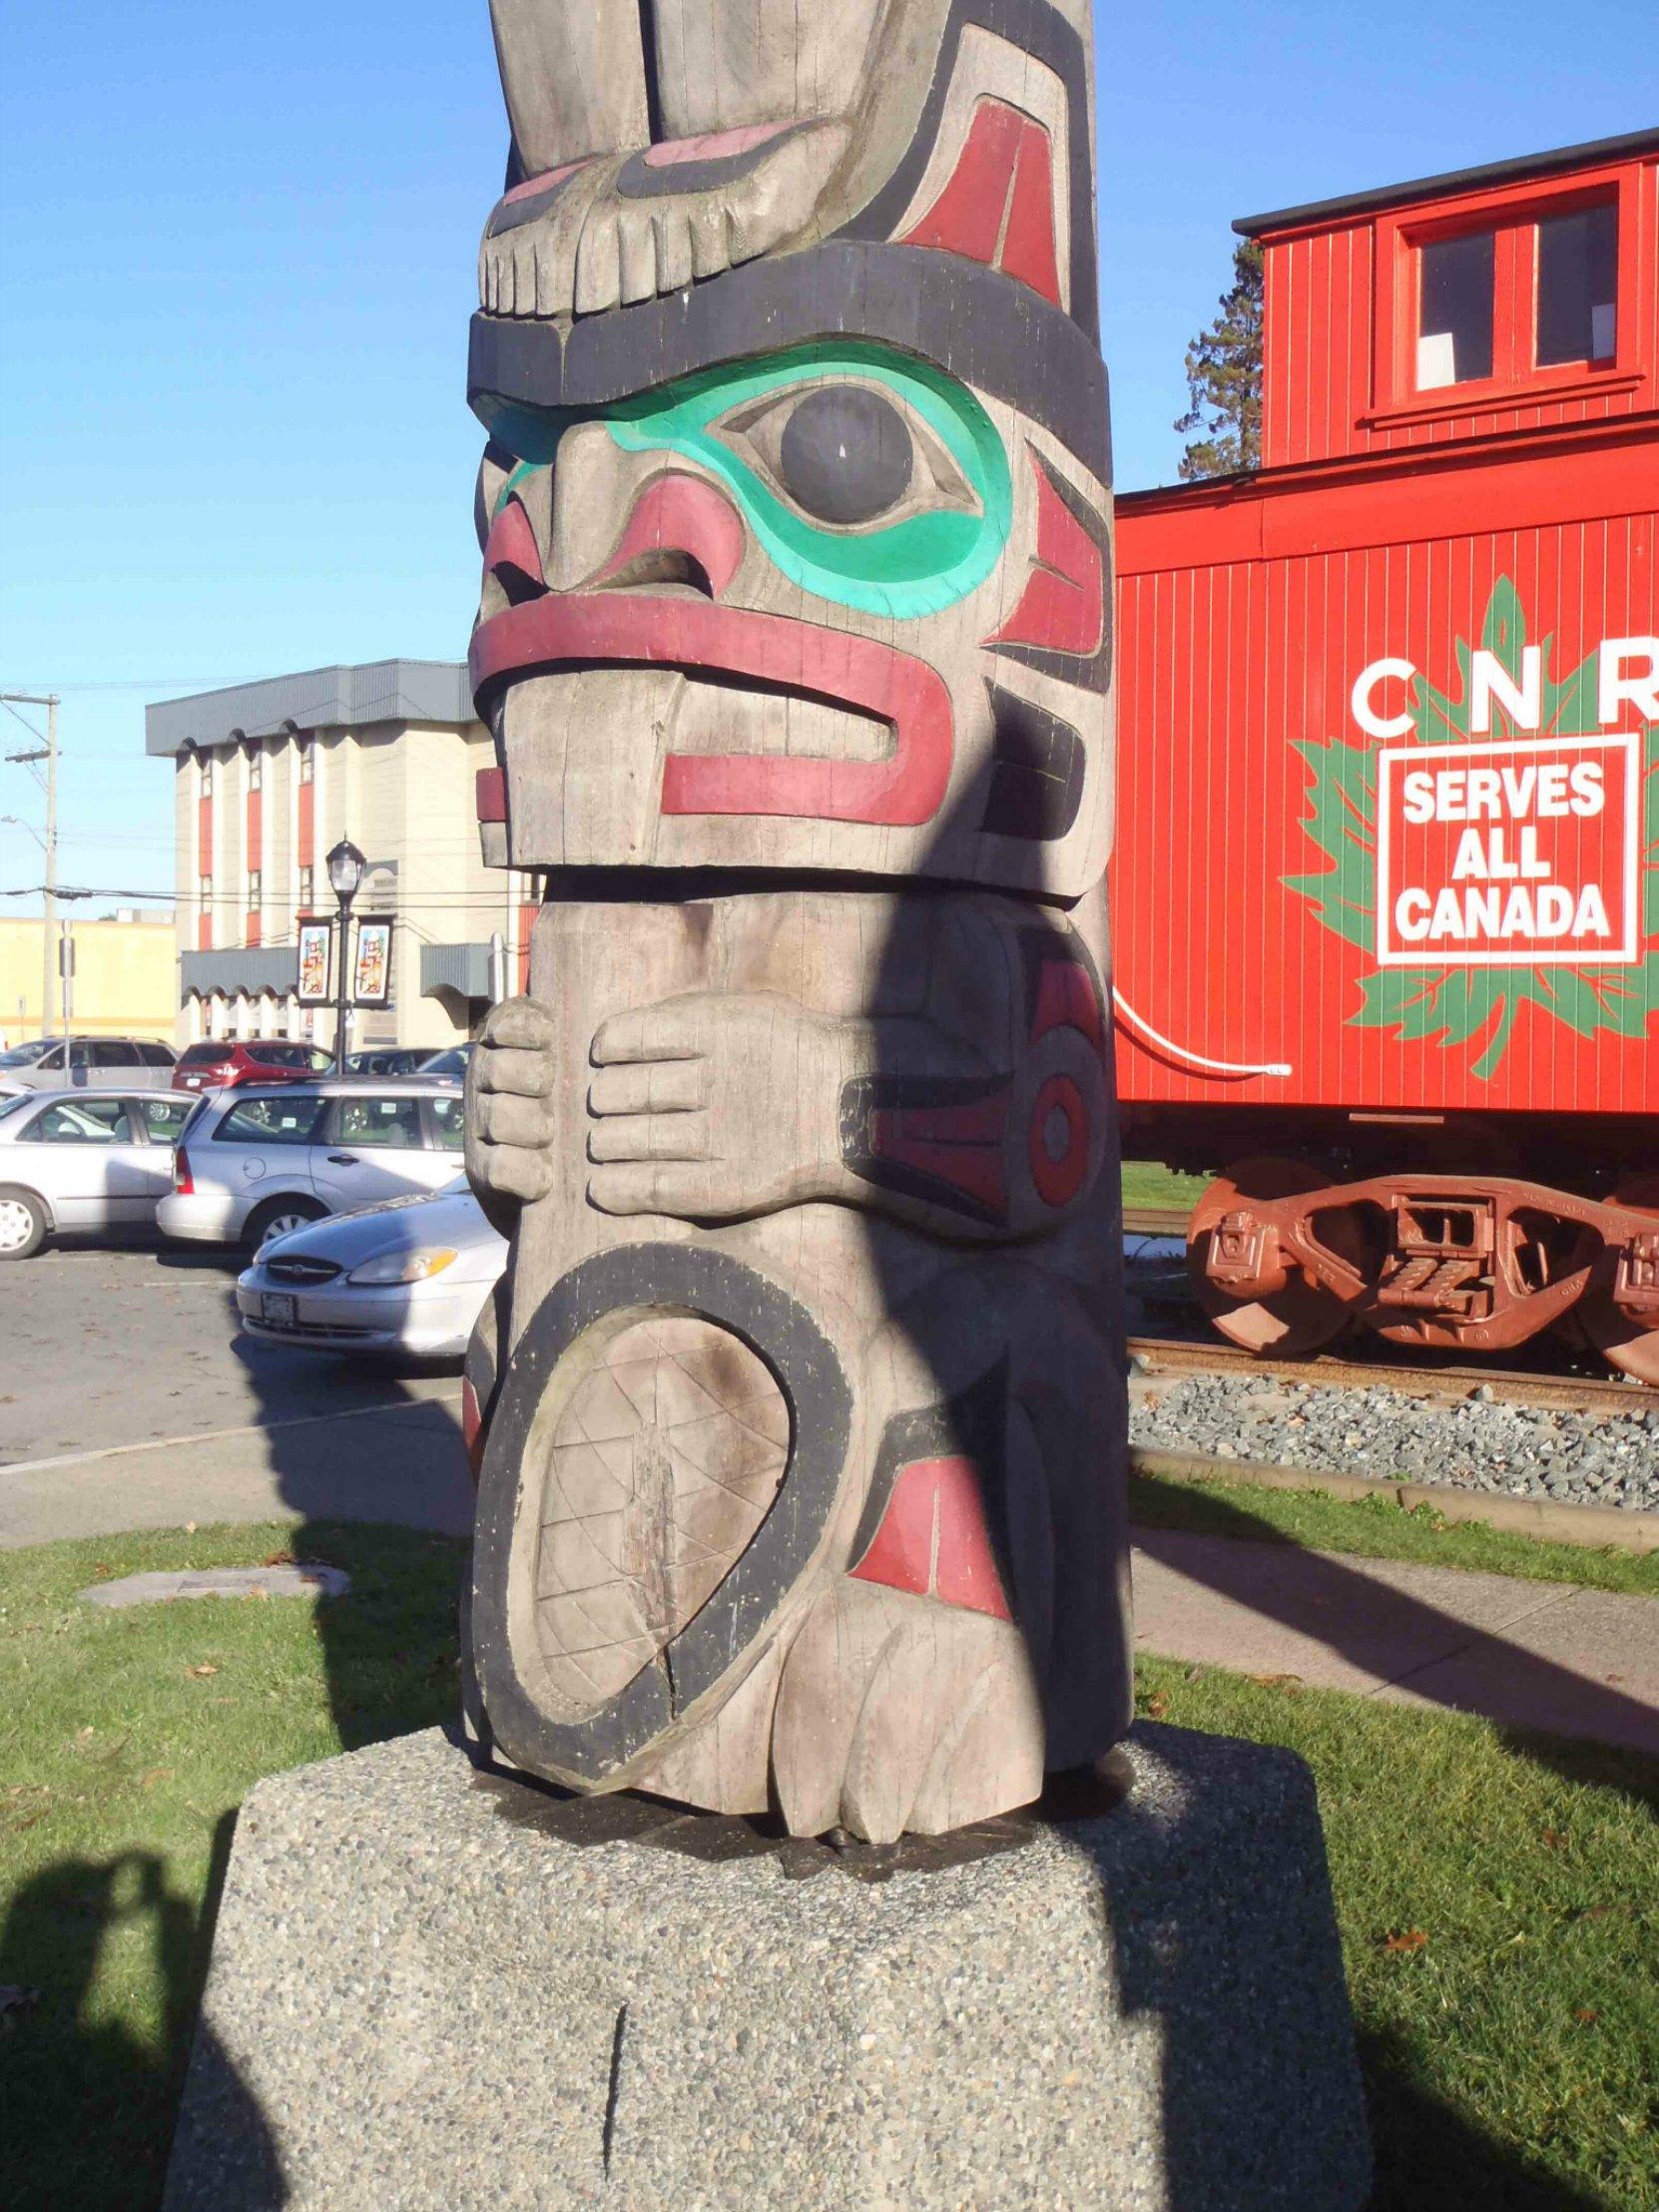 Raven's Gift totem pole, Beaver figure, Canada Avenue, Duncan, B.C.